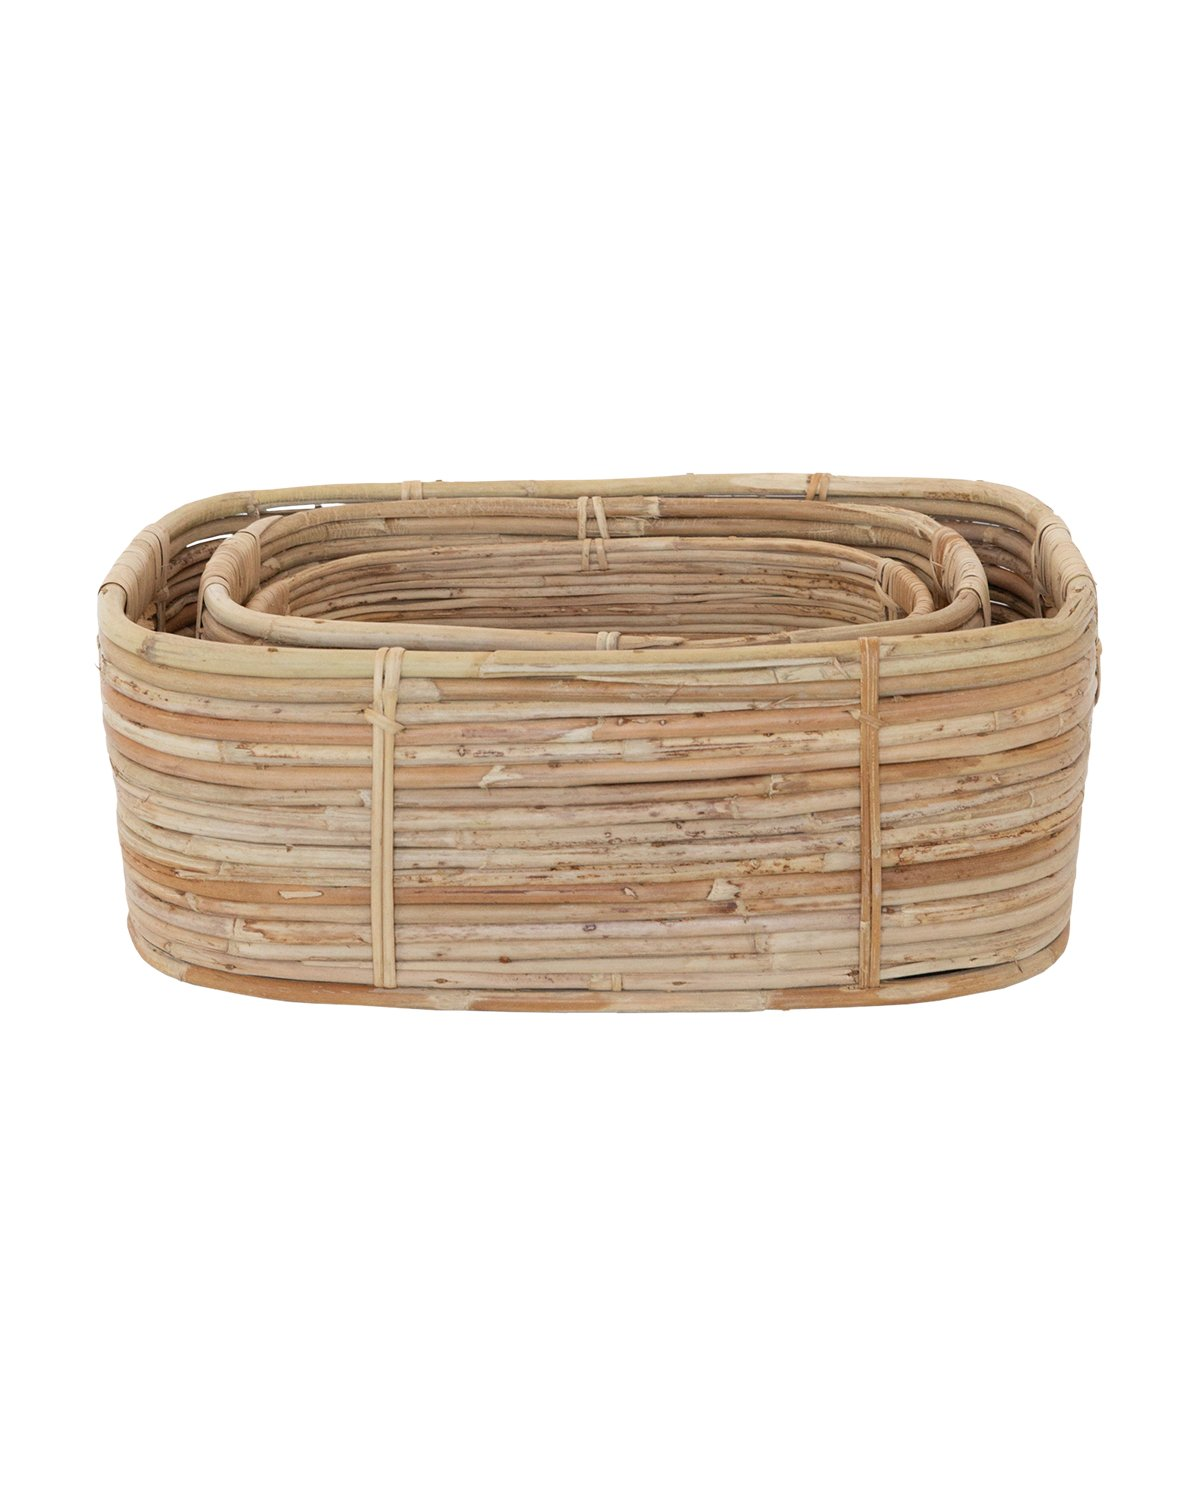 Cane_Rattan_Rectangle_Baskets.jpg